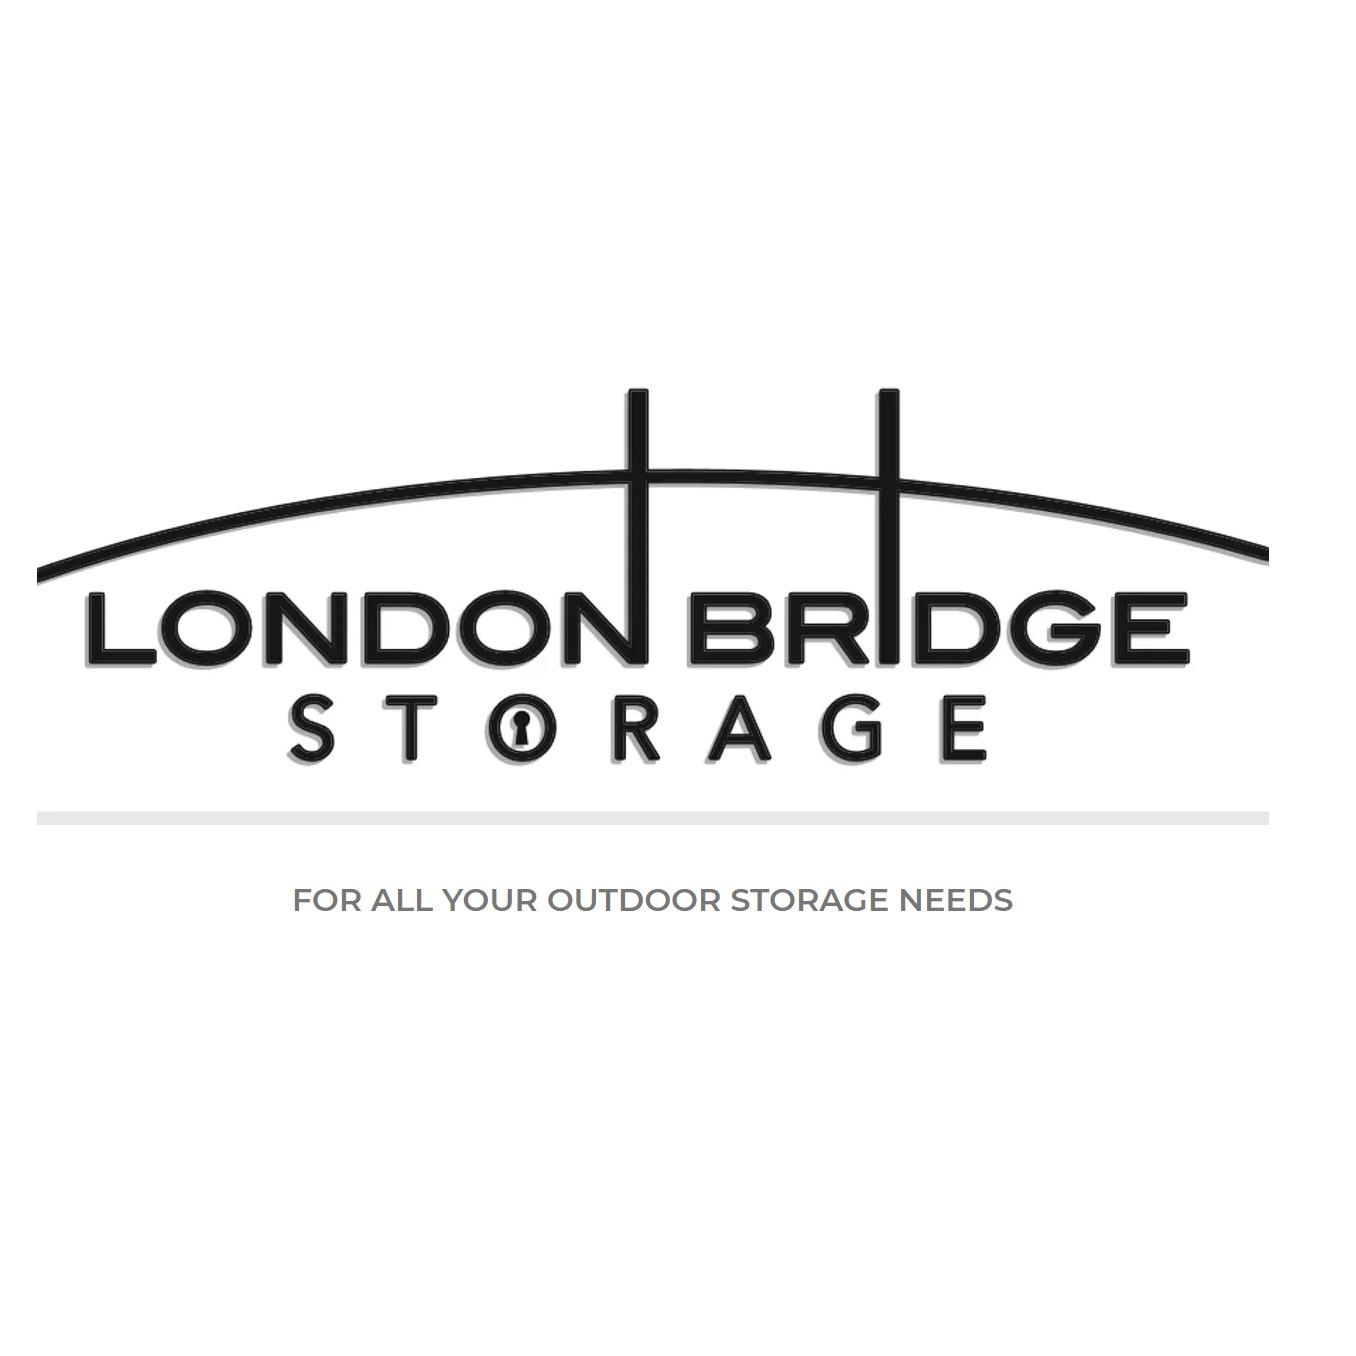 London Bridge Storage